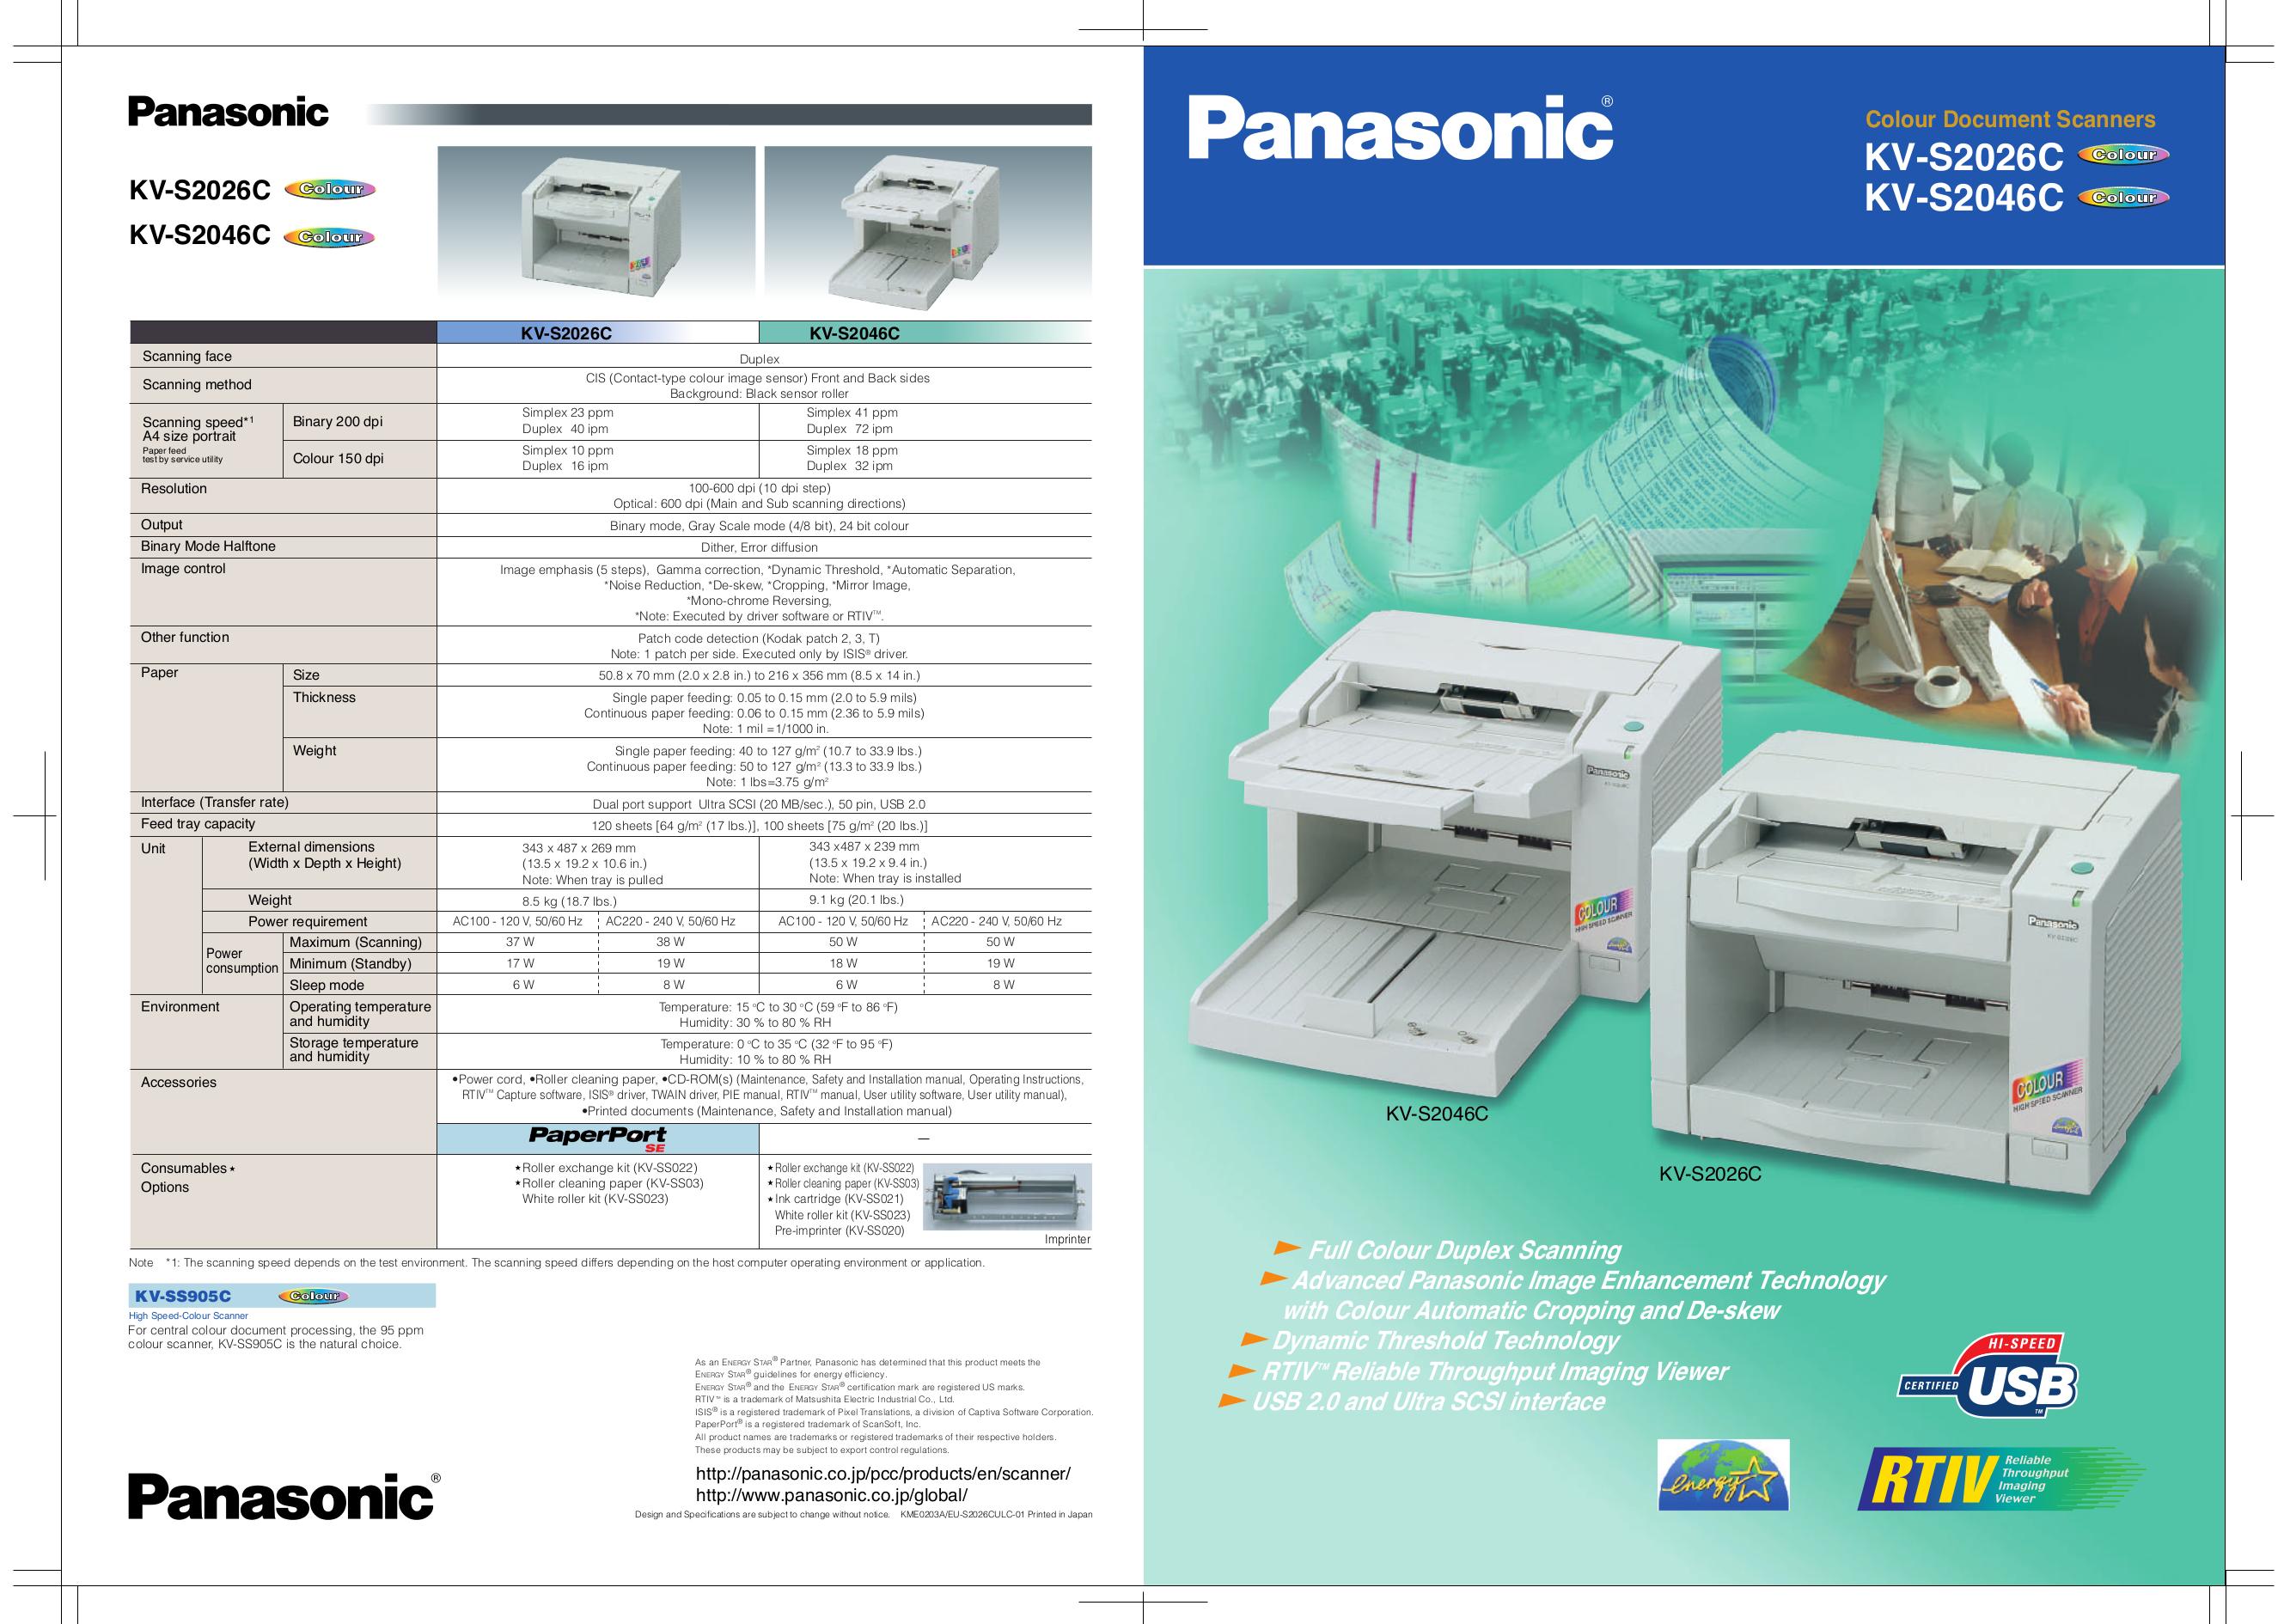 download free pdf for panasonic kv s2026c scanner manual rh umlib com Panasonic Set Top Box Panasonic Cell Phone Camera